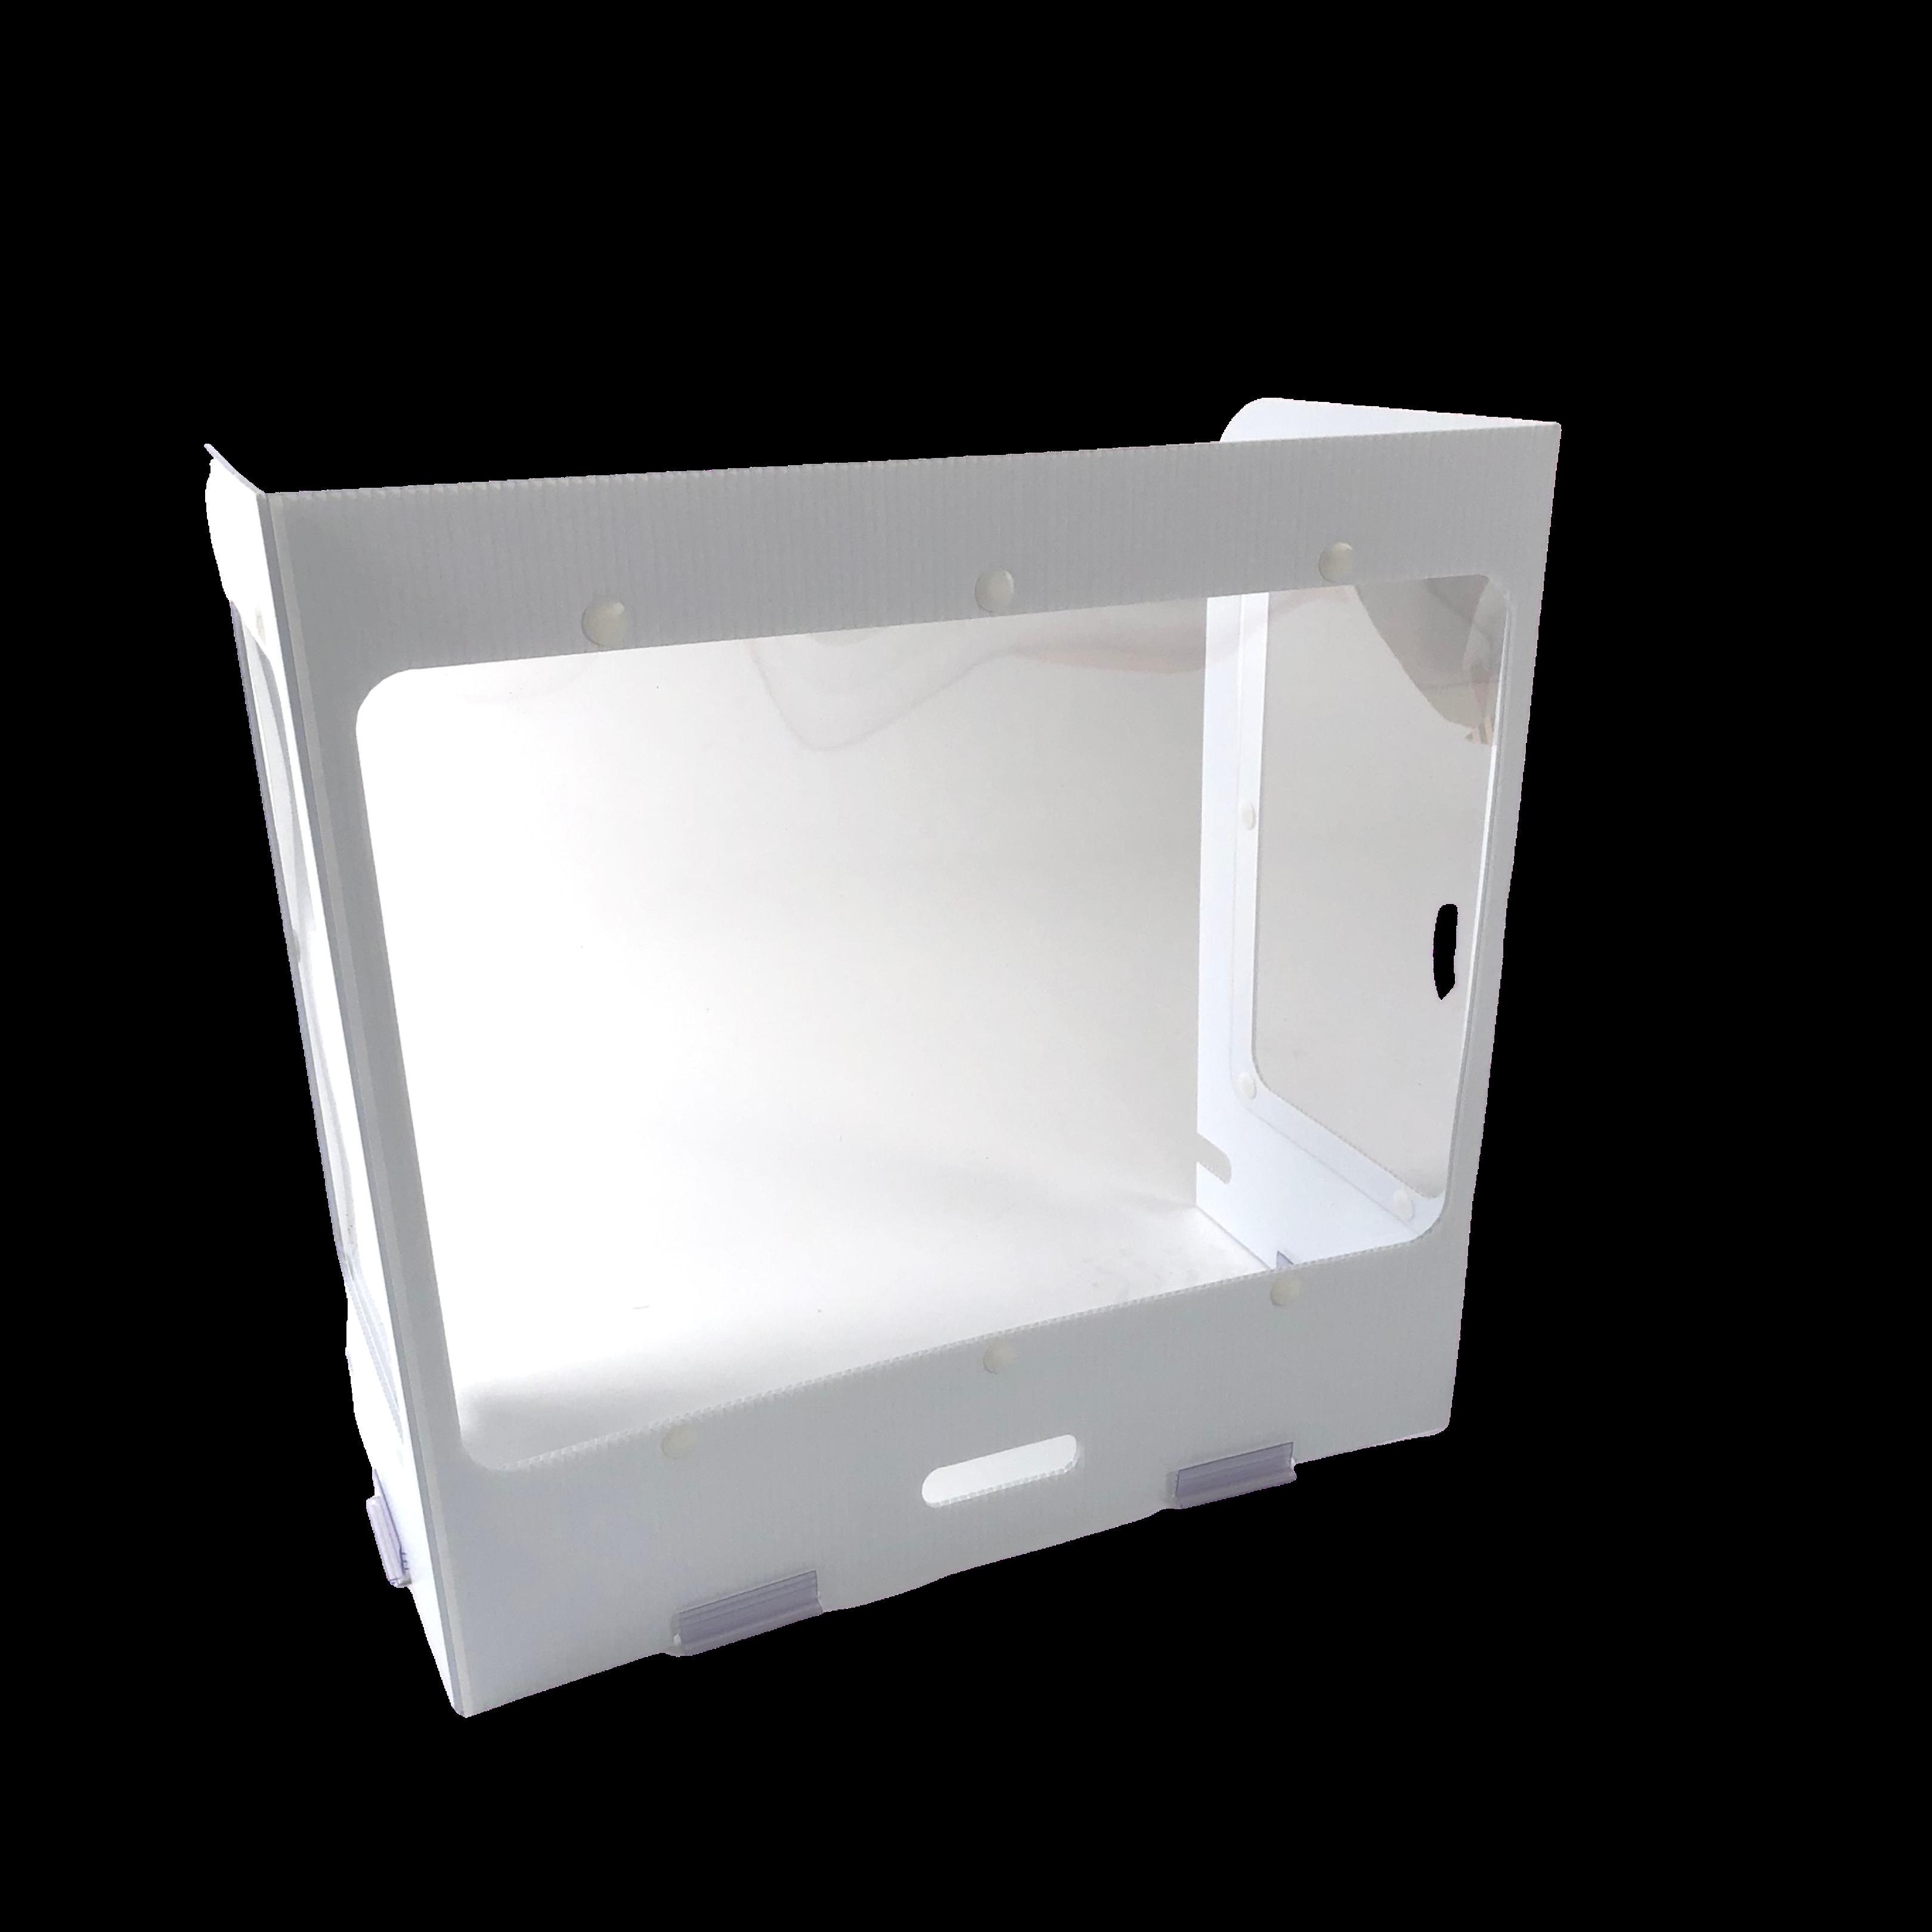 "24""w x 24""h x 12'd 3-Sided Portable Coroplast Desk Shield"